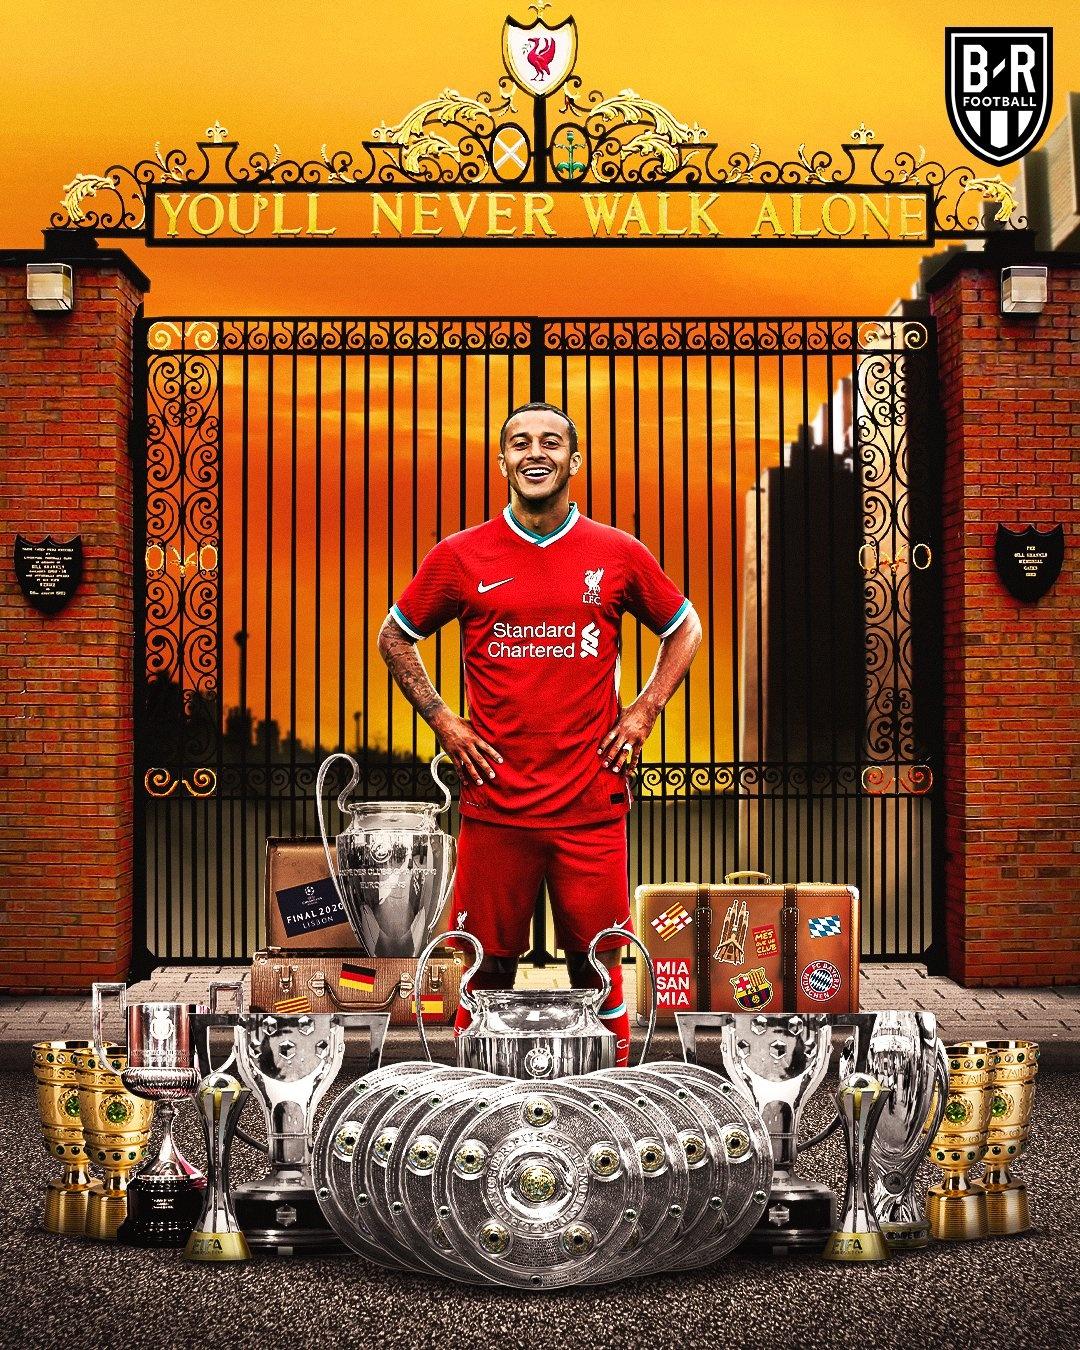 Thiago,  Liverpool,  Premier League,  Juergen Klopp,  Champions League,  Bayern,  Man United,  Chelsea,  Arsenal,  Barca anh 1